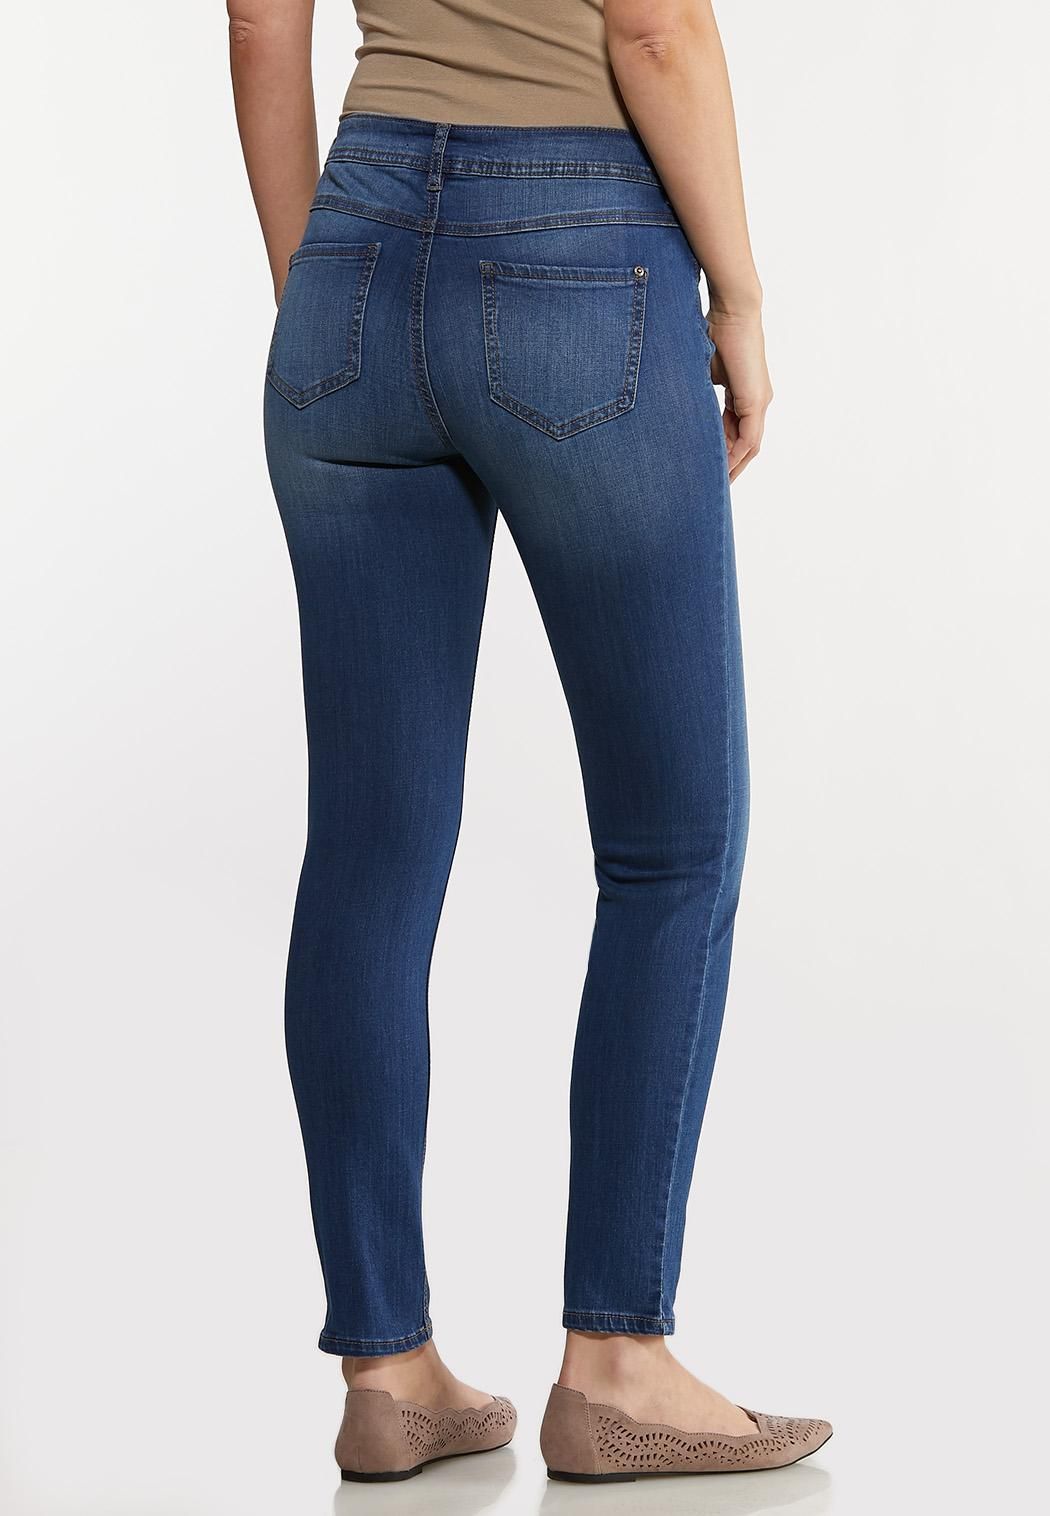 Medium Wash Skinny Jeans (Item #44133036)